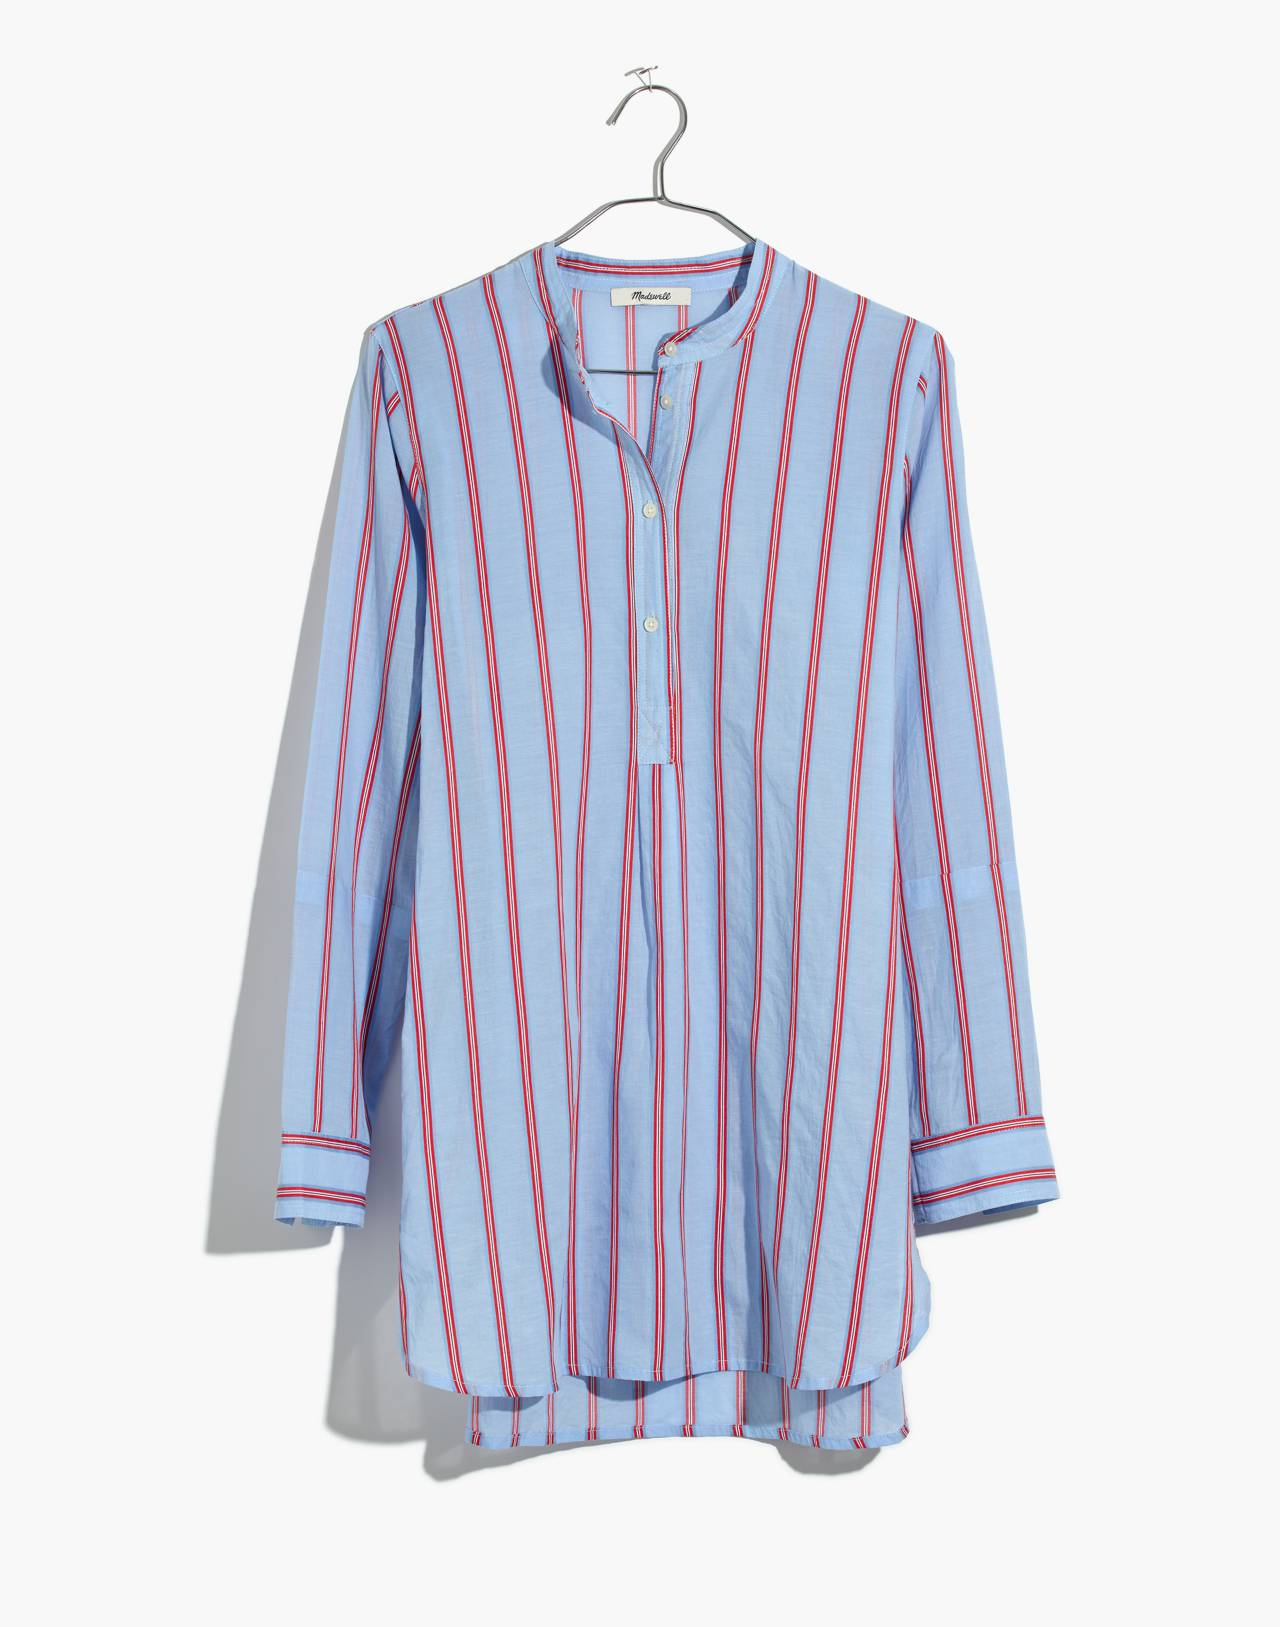 Wellspring Tunic Popover Shirt in Atwater Stripe in dark sea image 4